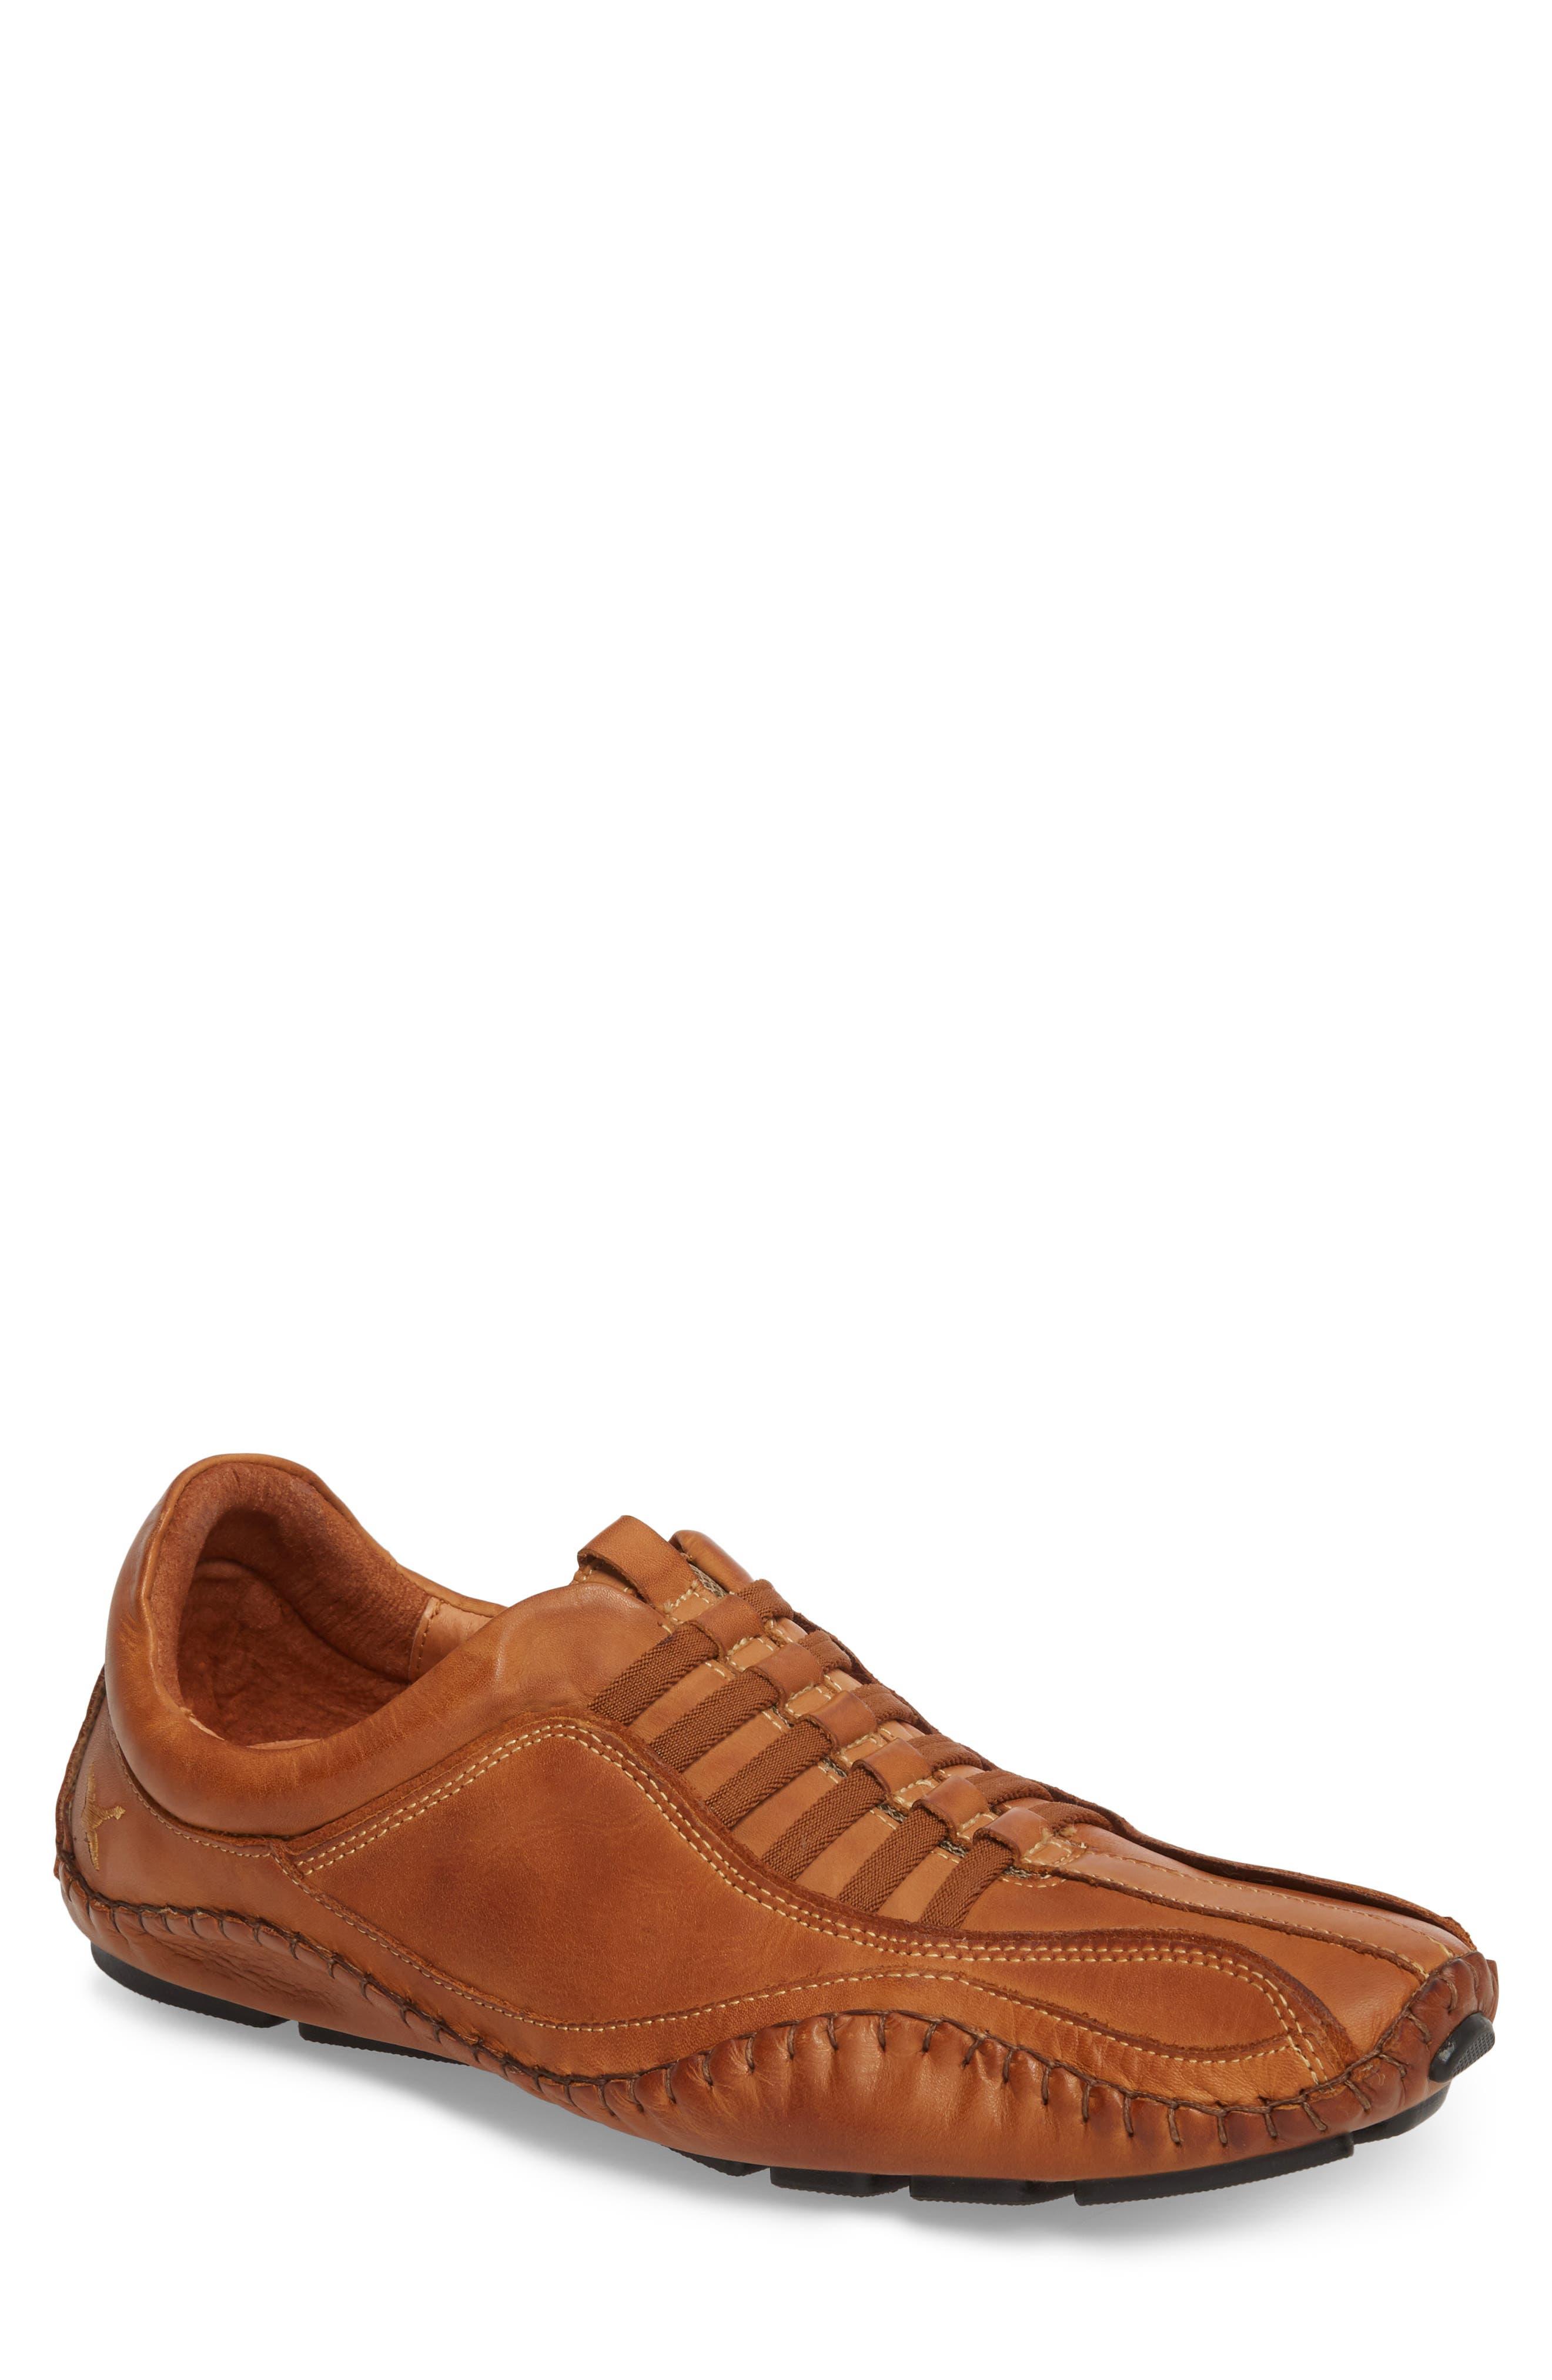 'Fuencarral' Driving Shoe,                         Main,                         color, Light Brown